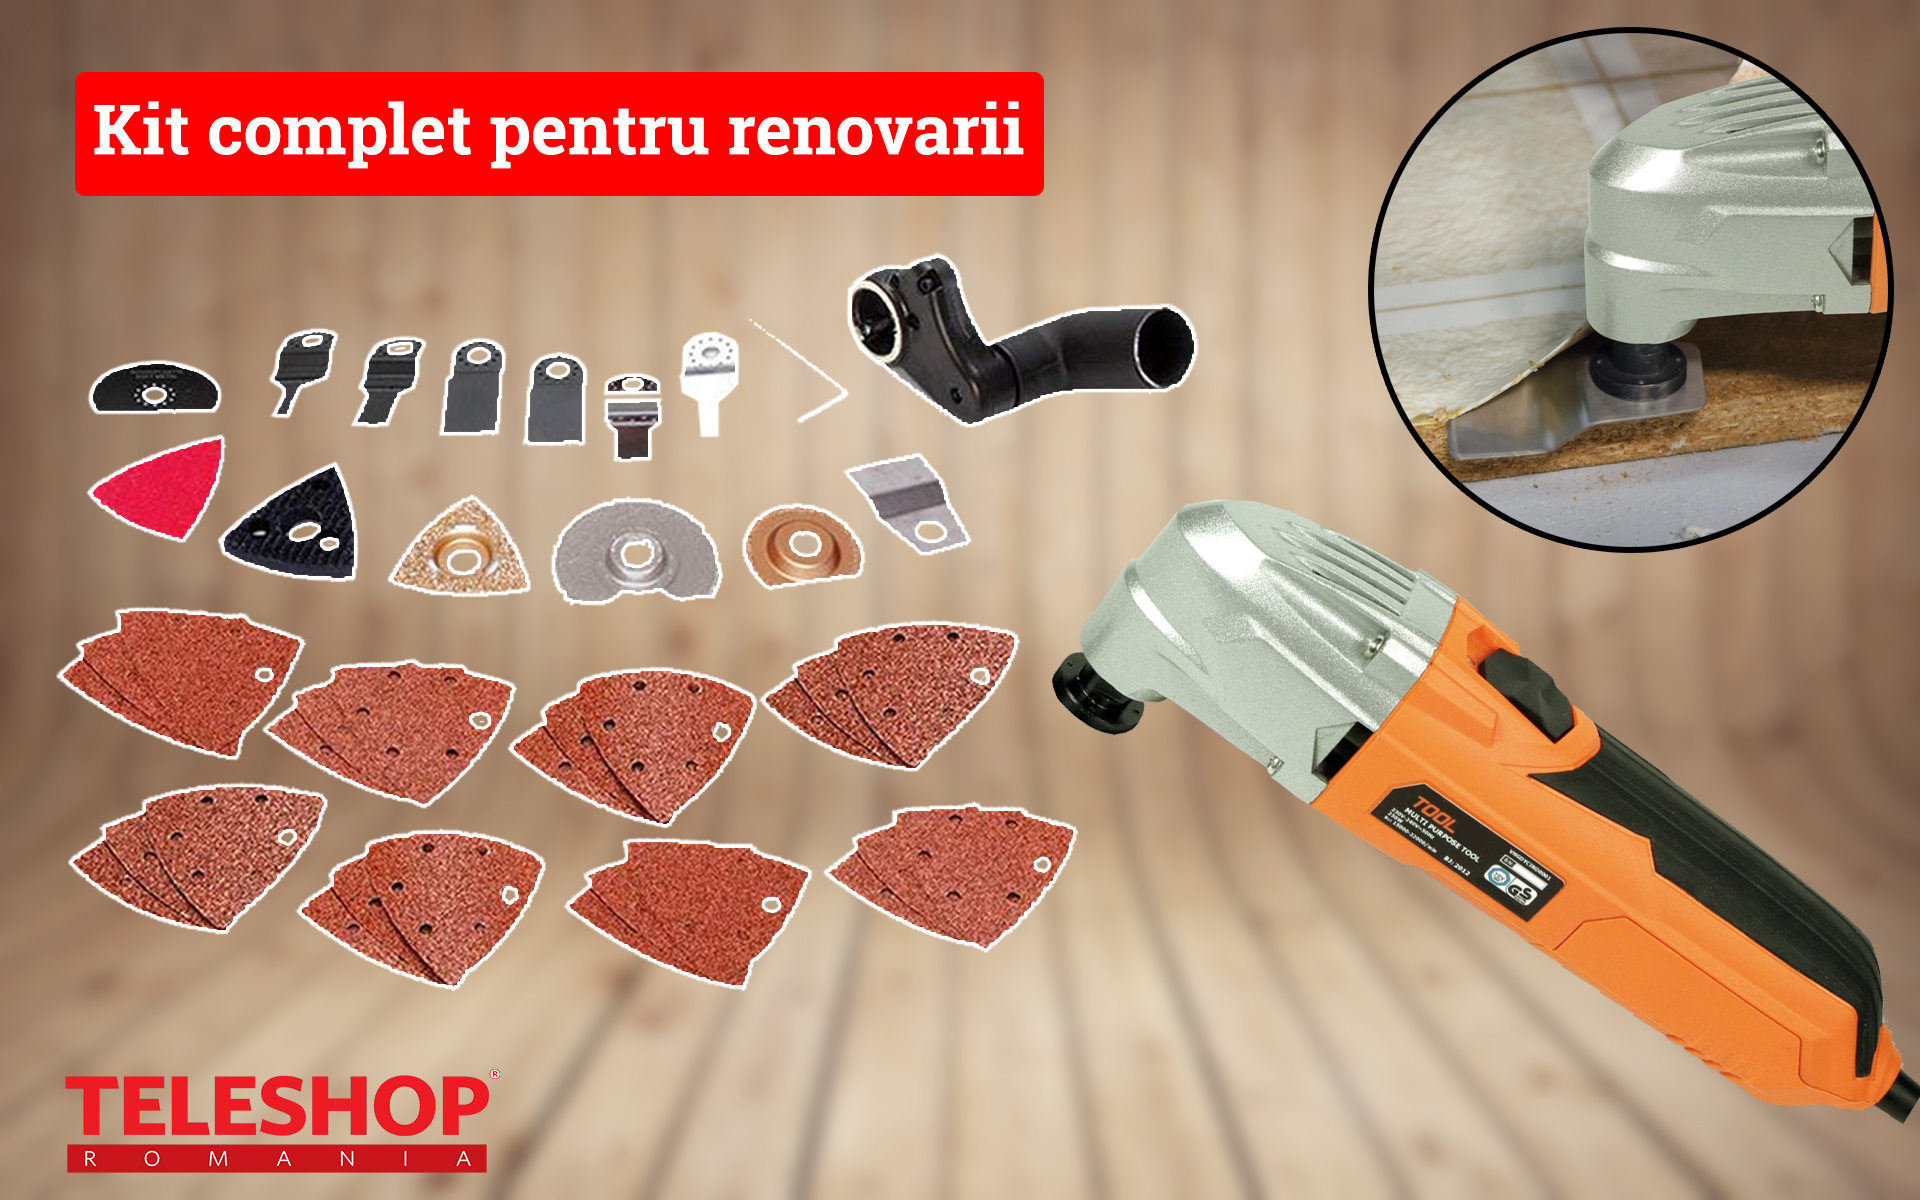 Image of Kit complet pentru renovarii